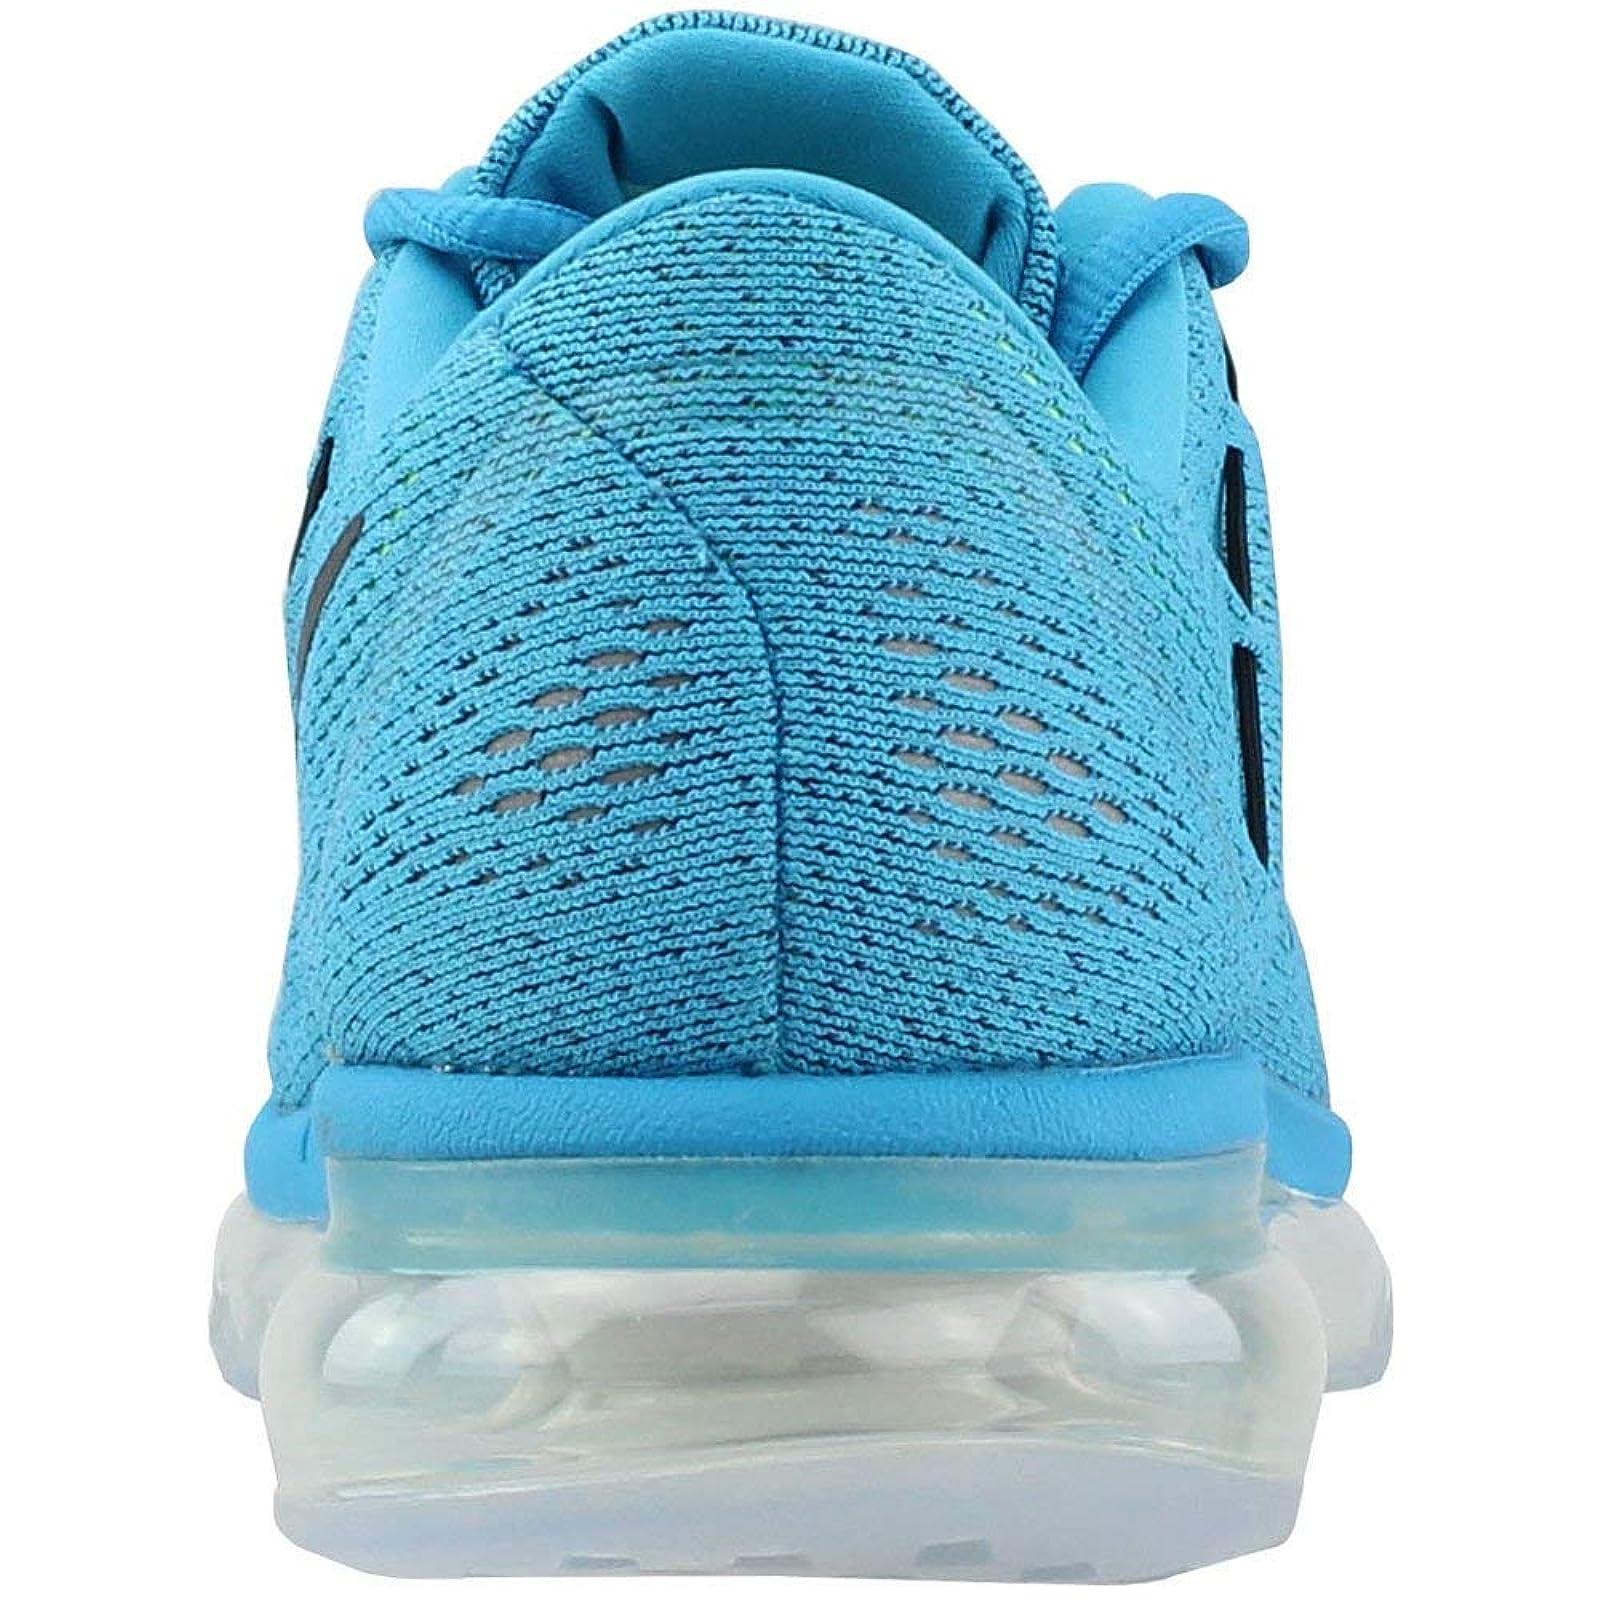 Nike Men's Air Max 2016 Running Shoe 8 M US - 2